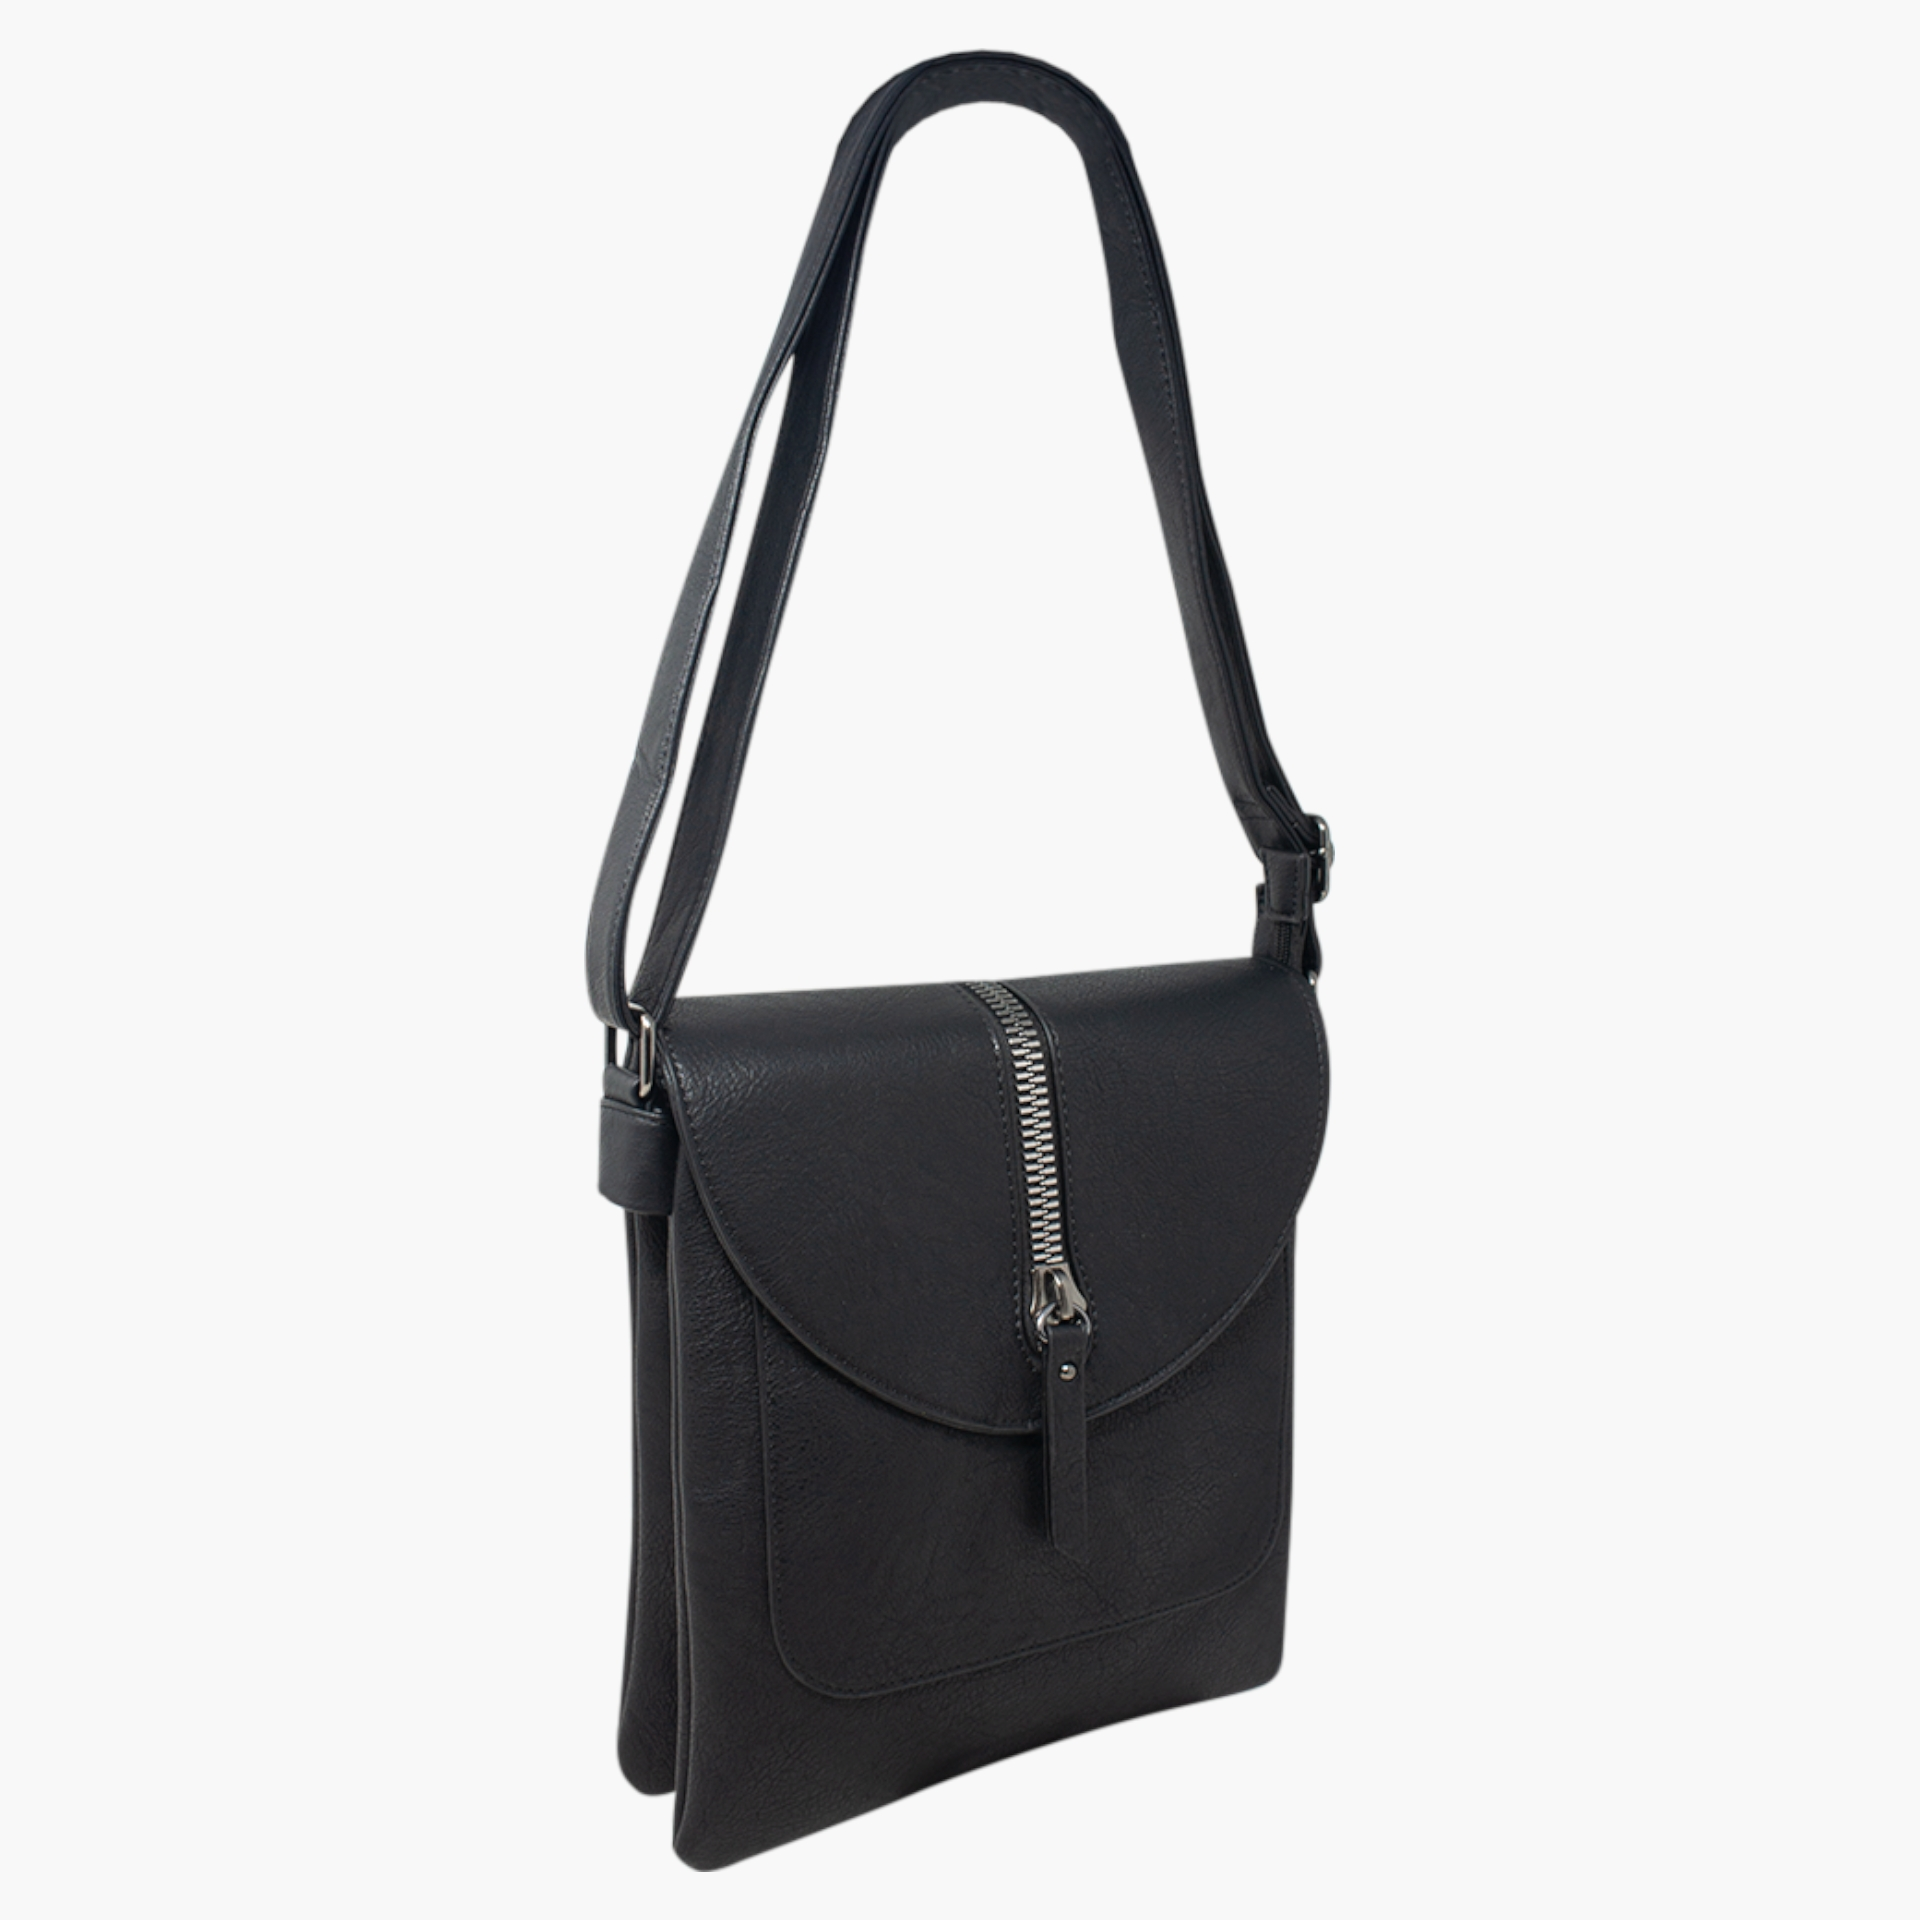 Cross Body Bag with Zip Detail - Black